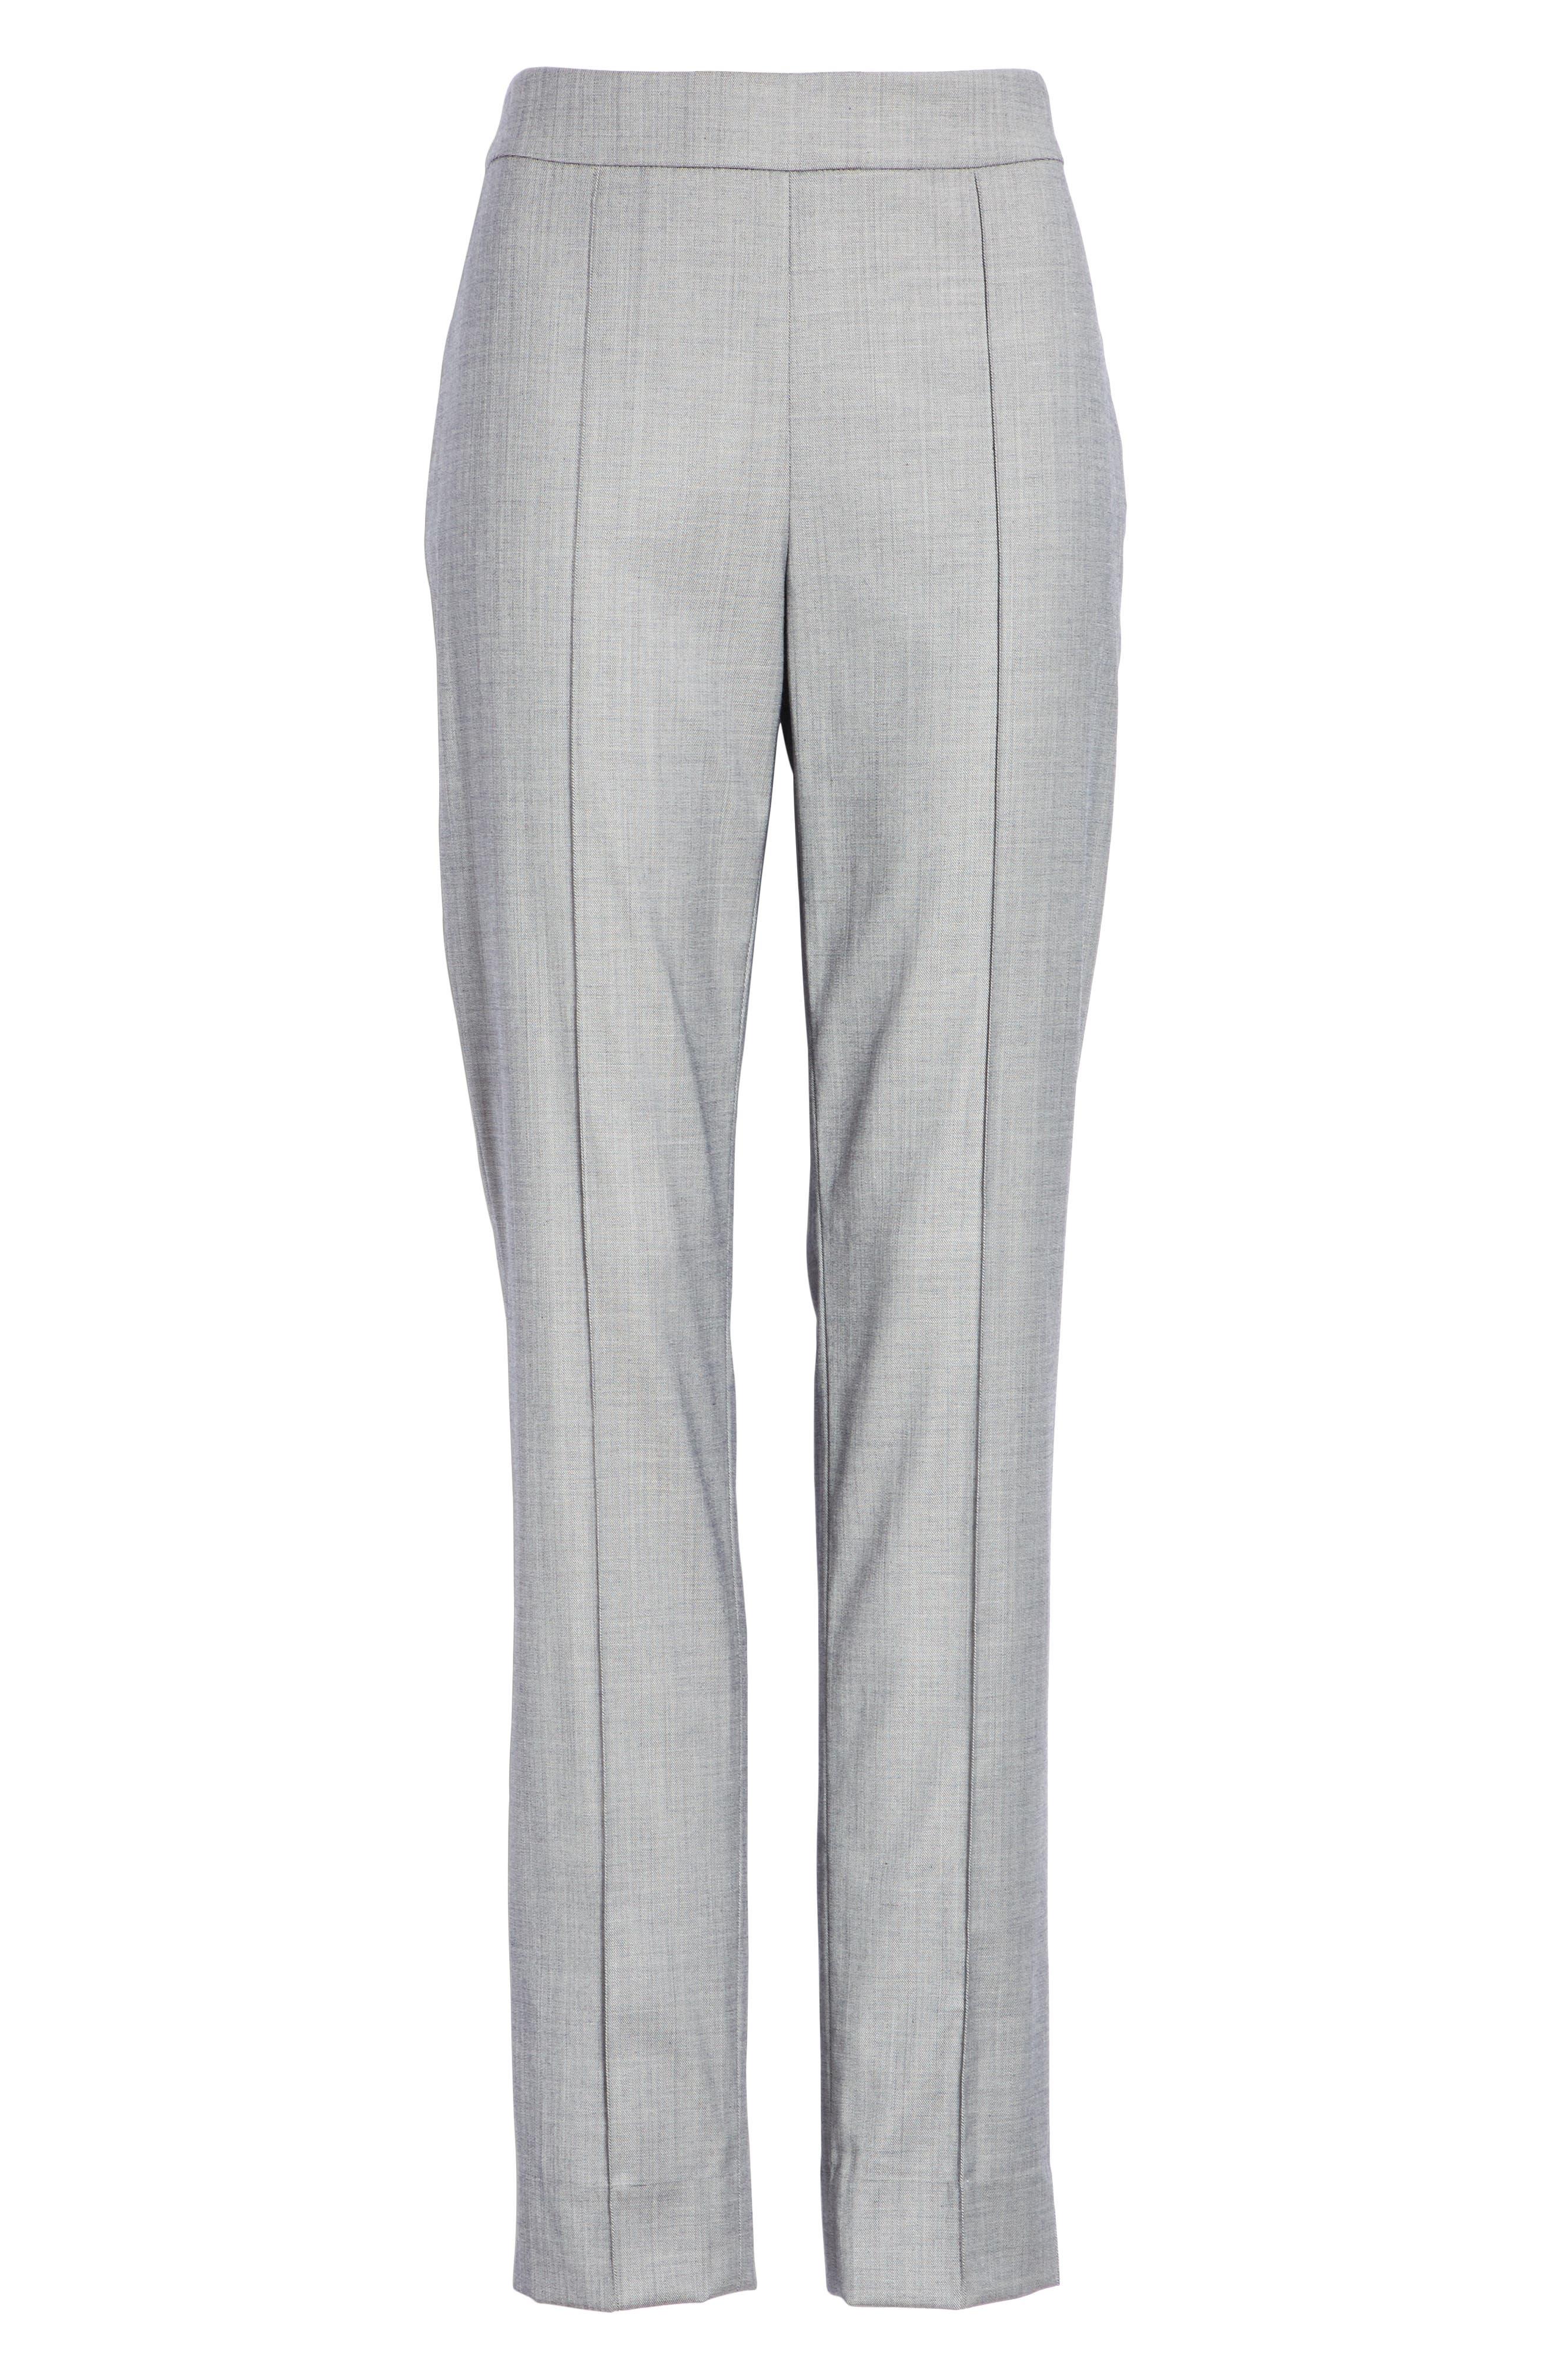 Sharkskin Stretch Wool Blend Skinny Ankle Pants,                             Alternate thumbnail 6, color,                             GREY MULTI